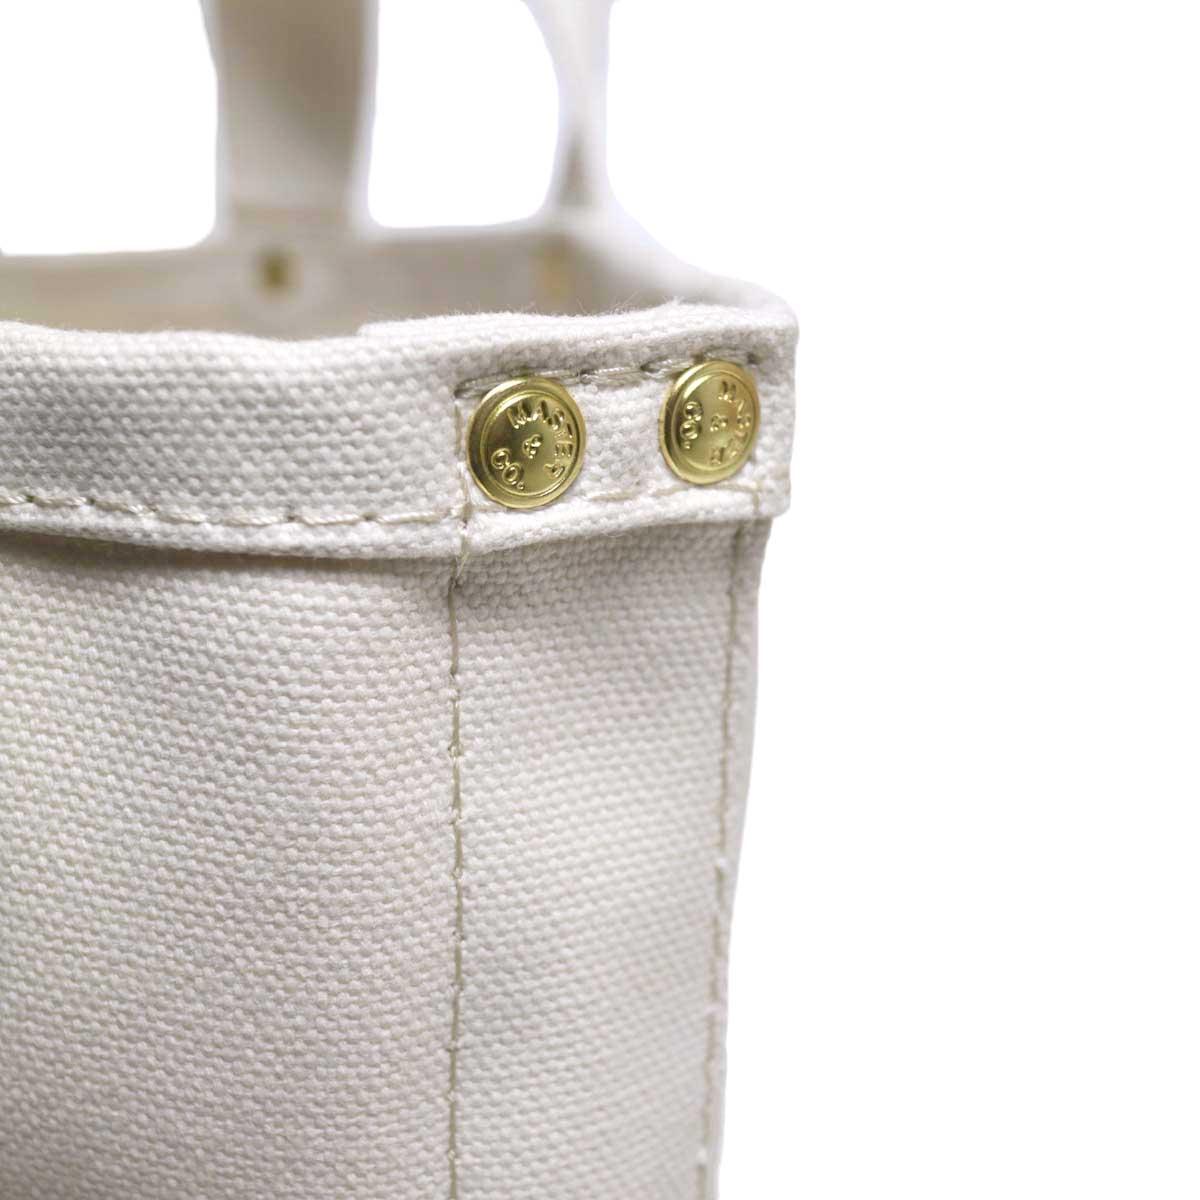 MASTER & Co. / RAILMAN BAG (White S) 刻印入りのリベット